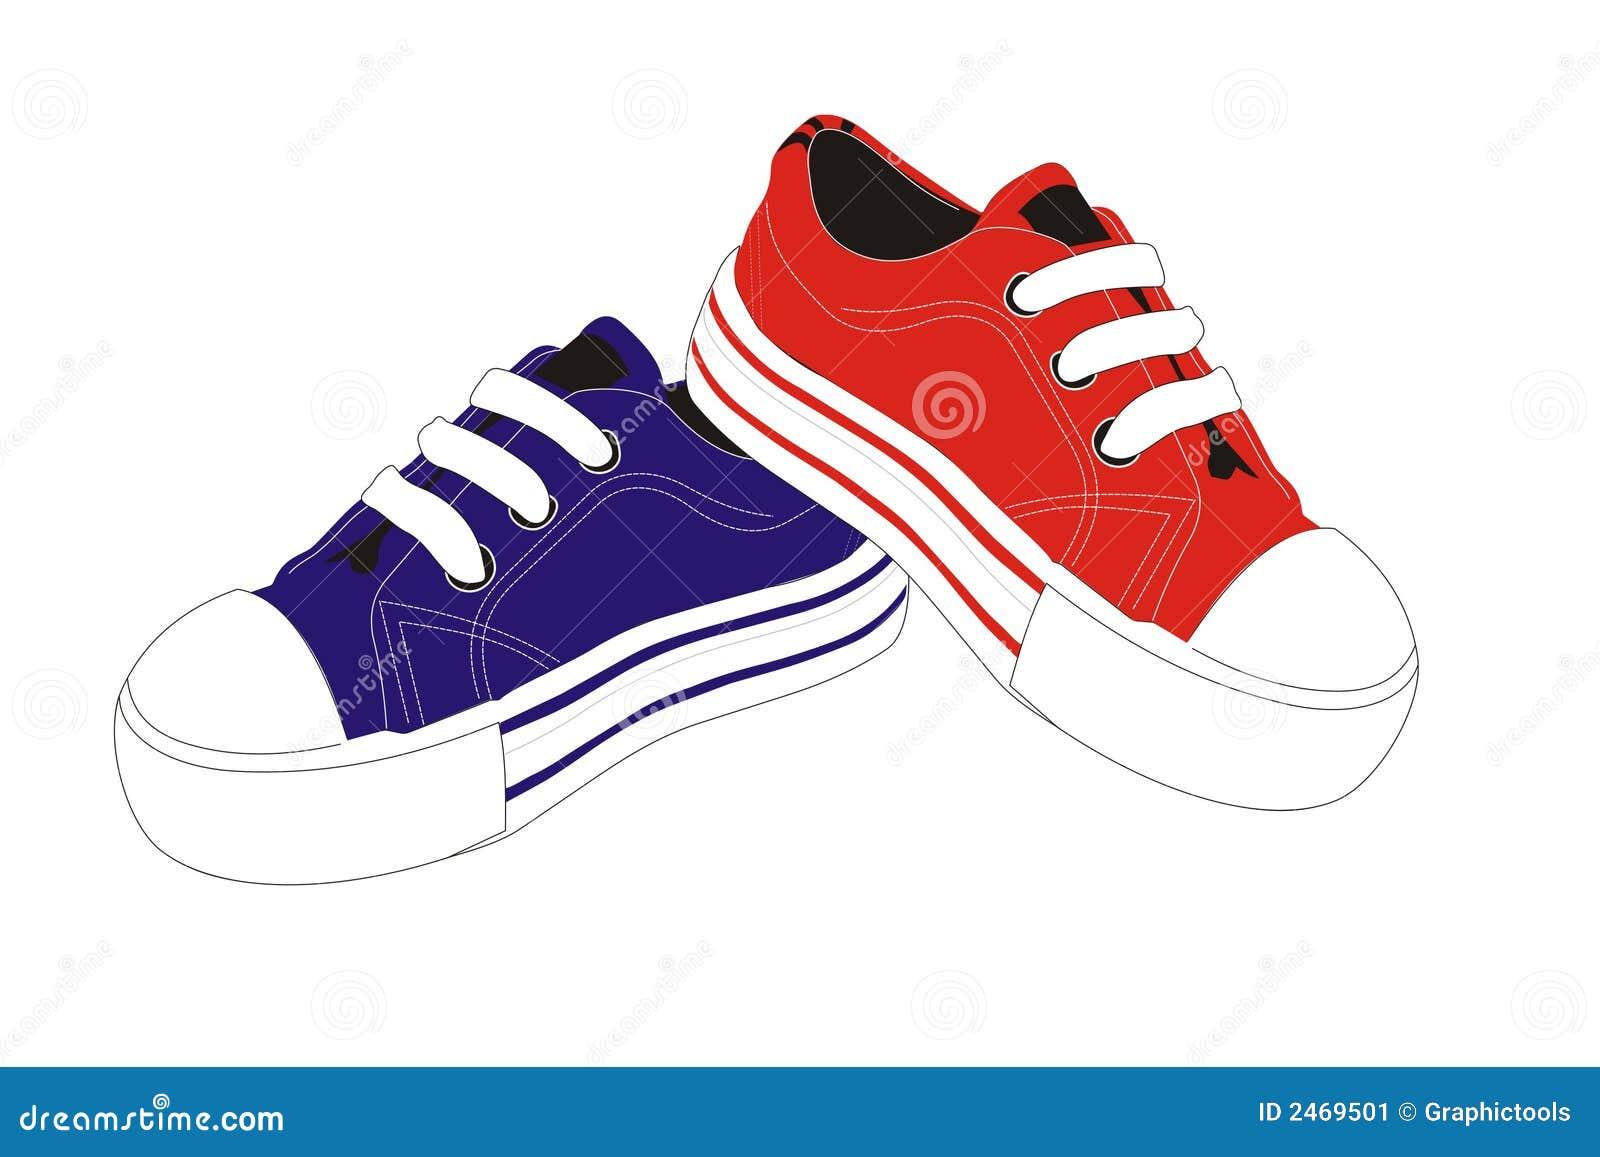 Illustration Chaussures De Sport Vecteur Illustration De Vecteur De Sport Chaussures Chaussures IY7yvfm6gb